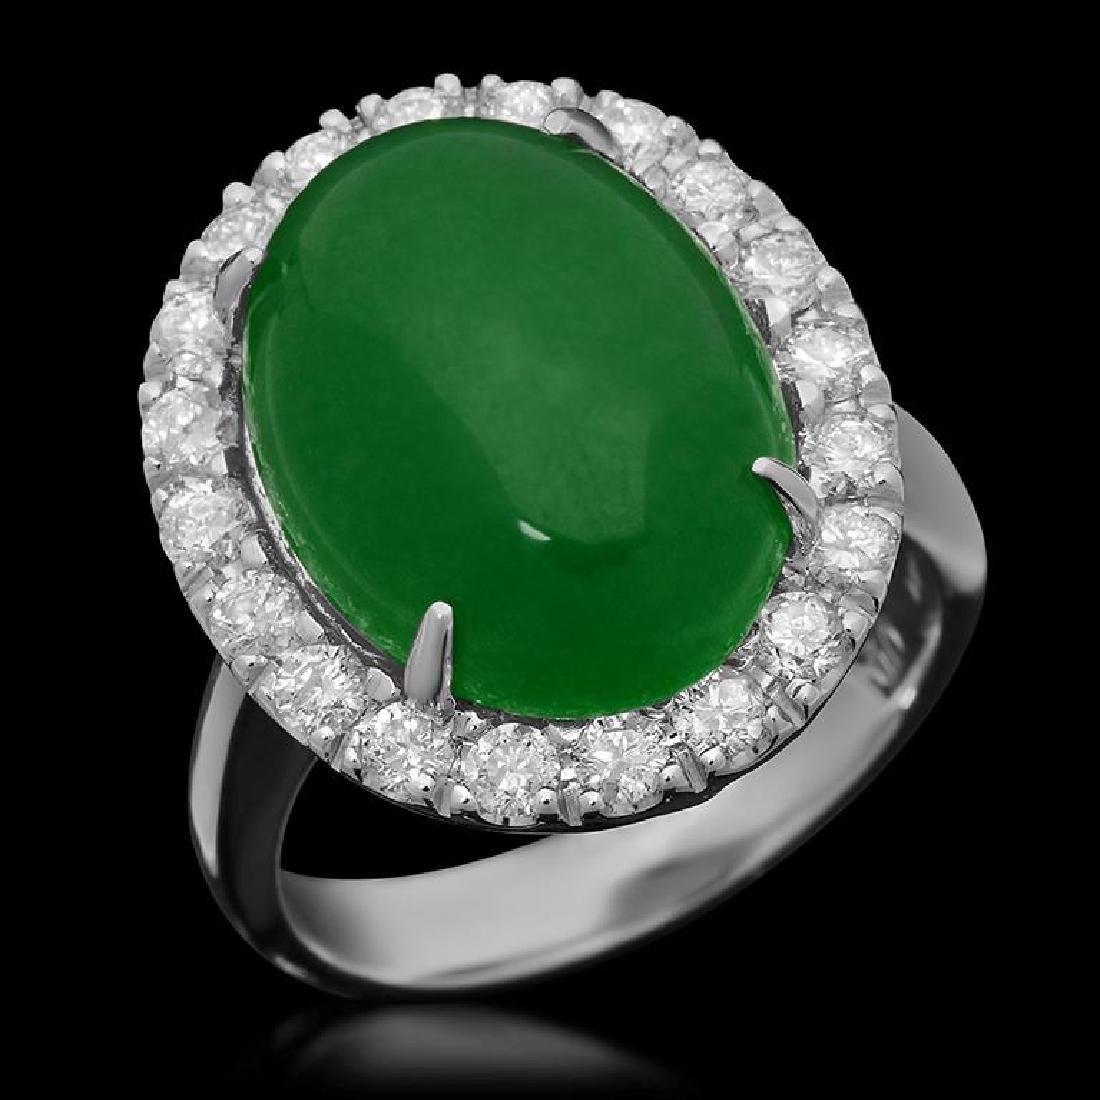 14K Gold 8.41ct Jadeite & 0.95ct Diamond Ring